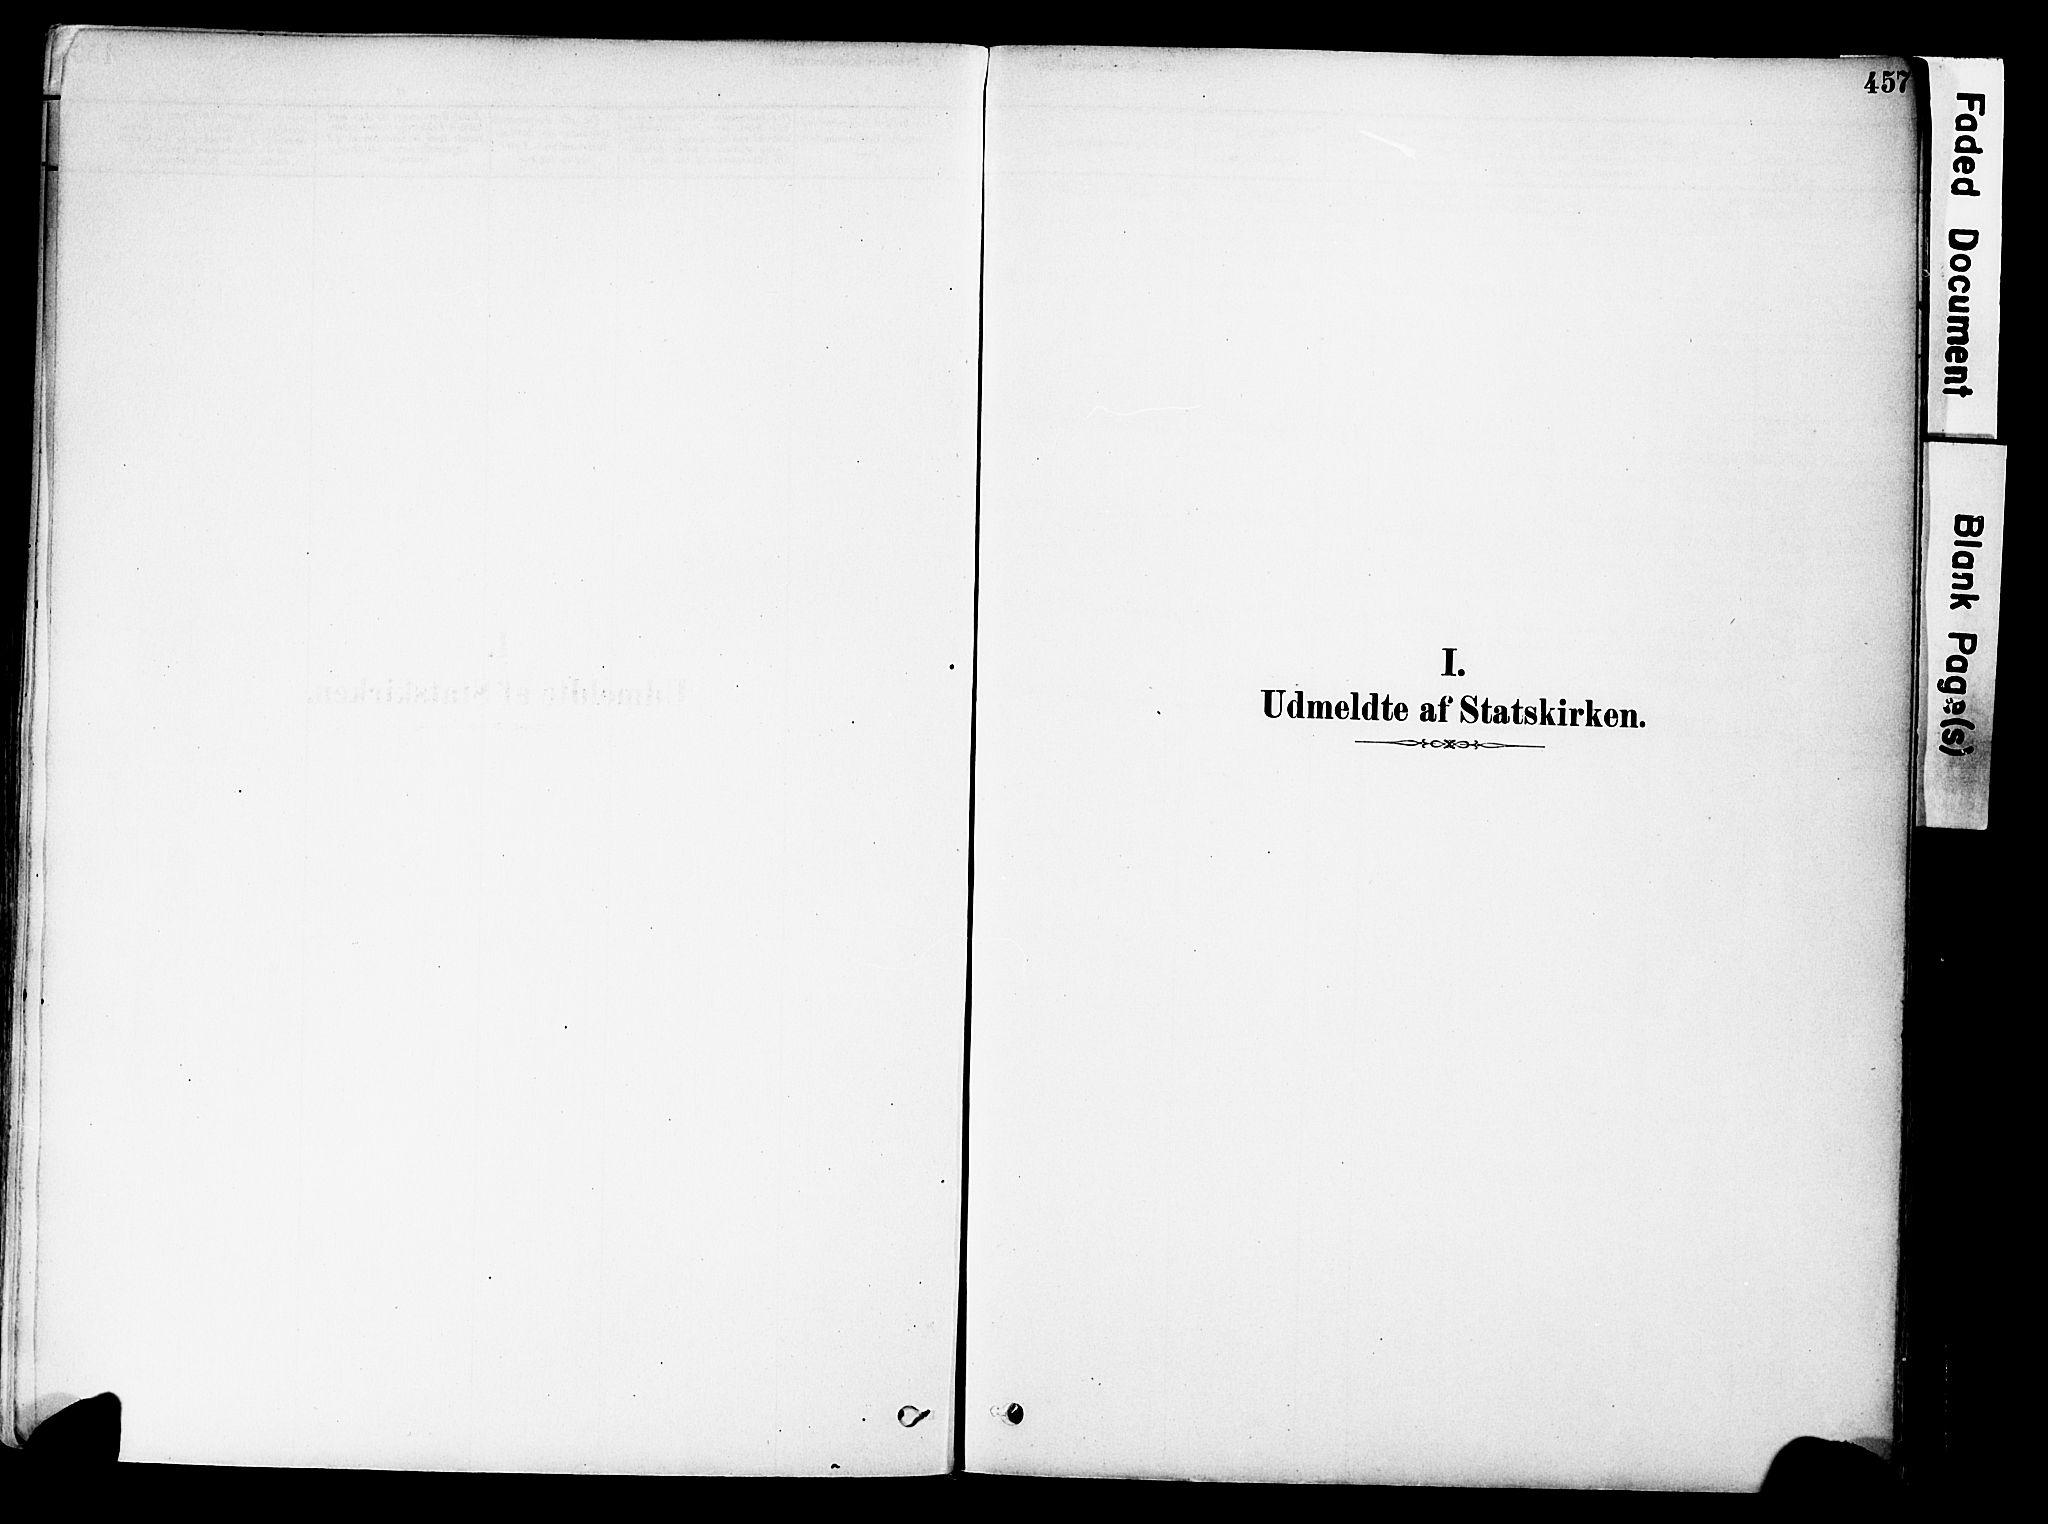 SAH, Østre Toten prestekontor, Ministerialbok nr. 6 /1, 1878-1896, s. 457